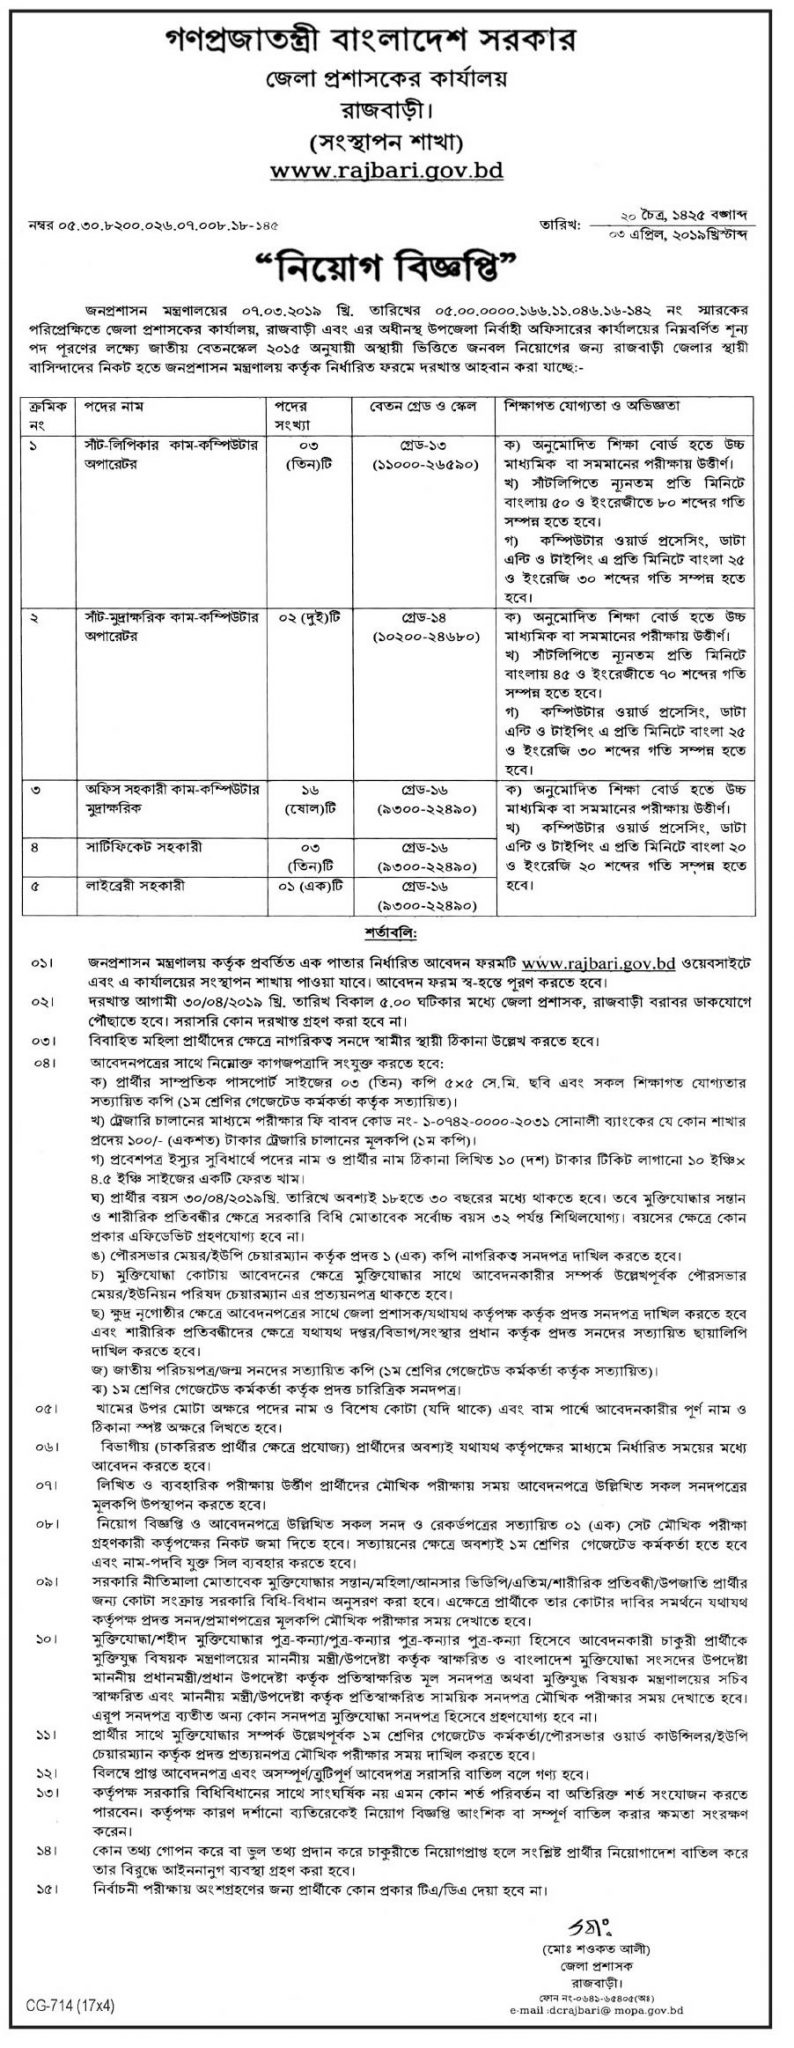 District Commissioner Office Job Circular 2019